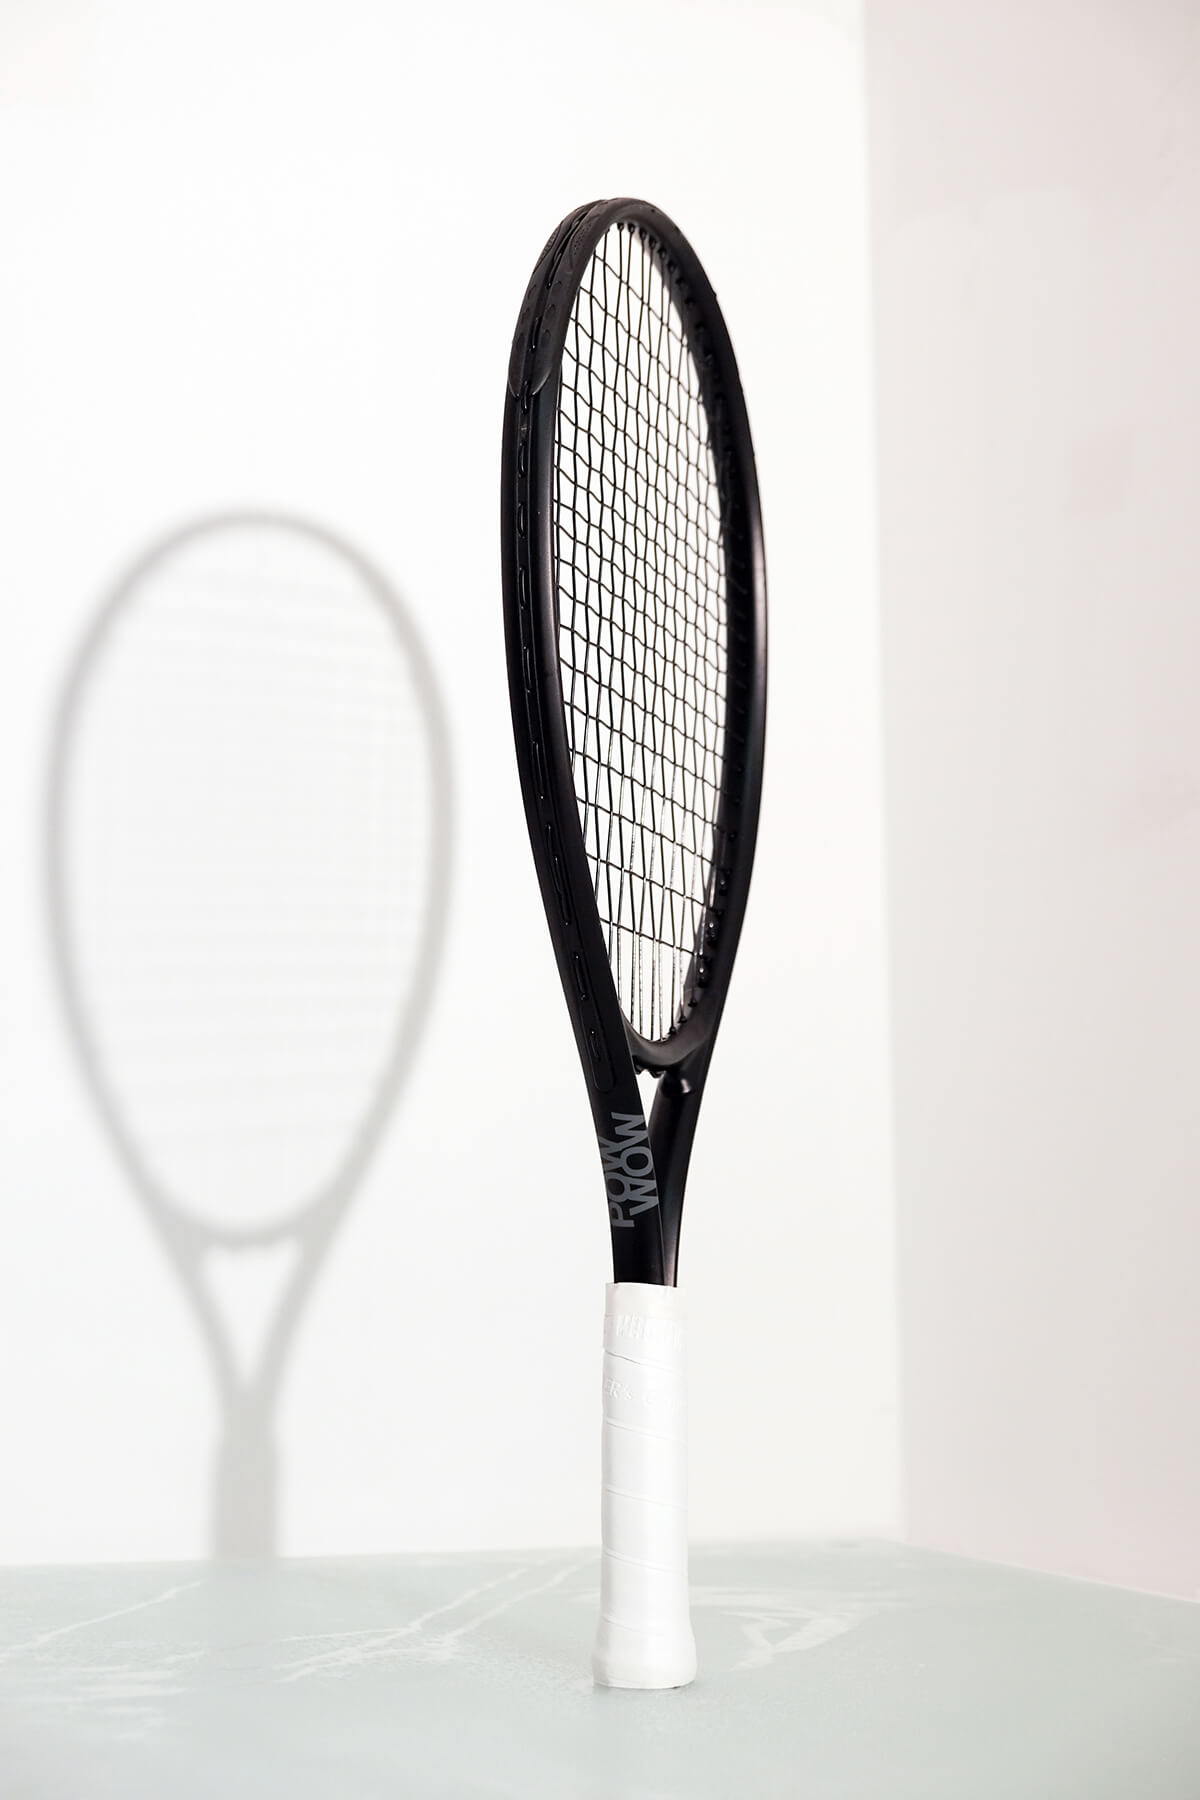 Tennisschlger powwow Frozen Black 21″ Schlger fr touchtennis ...